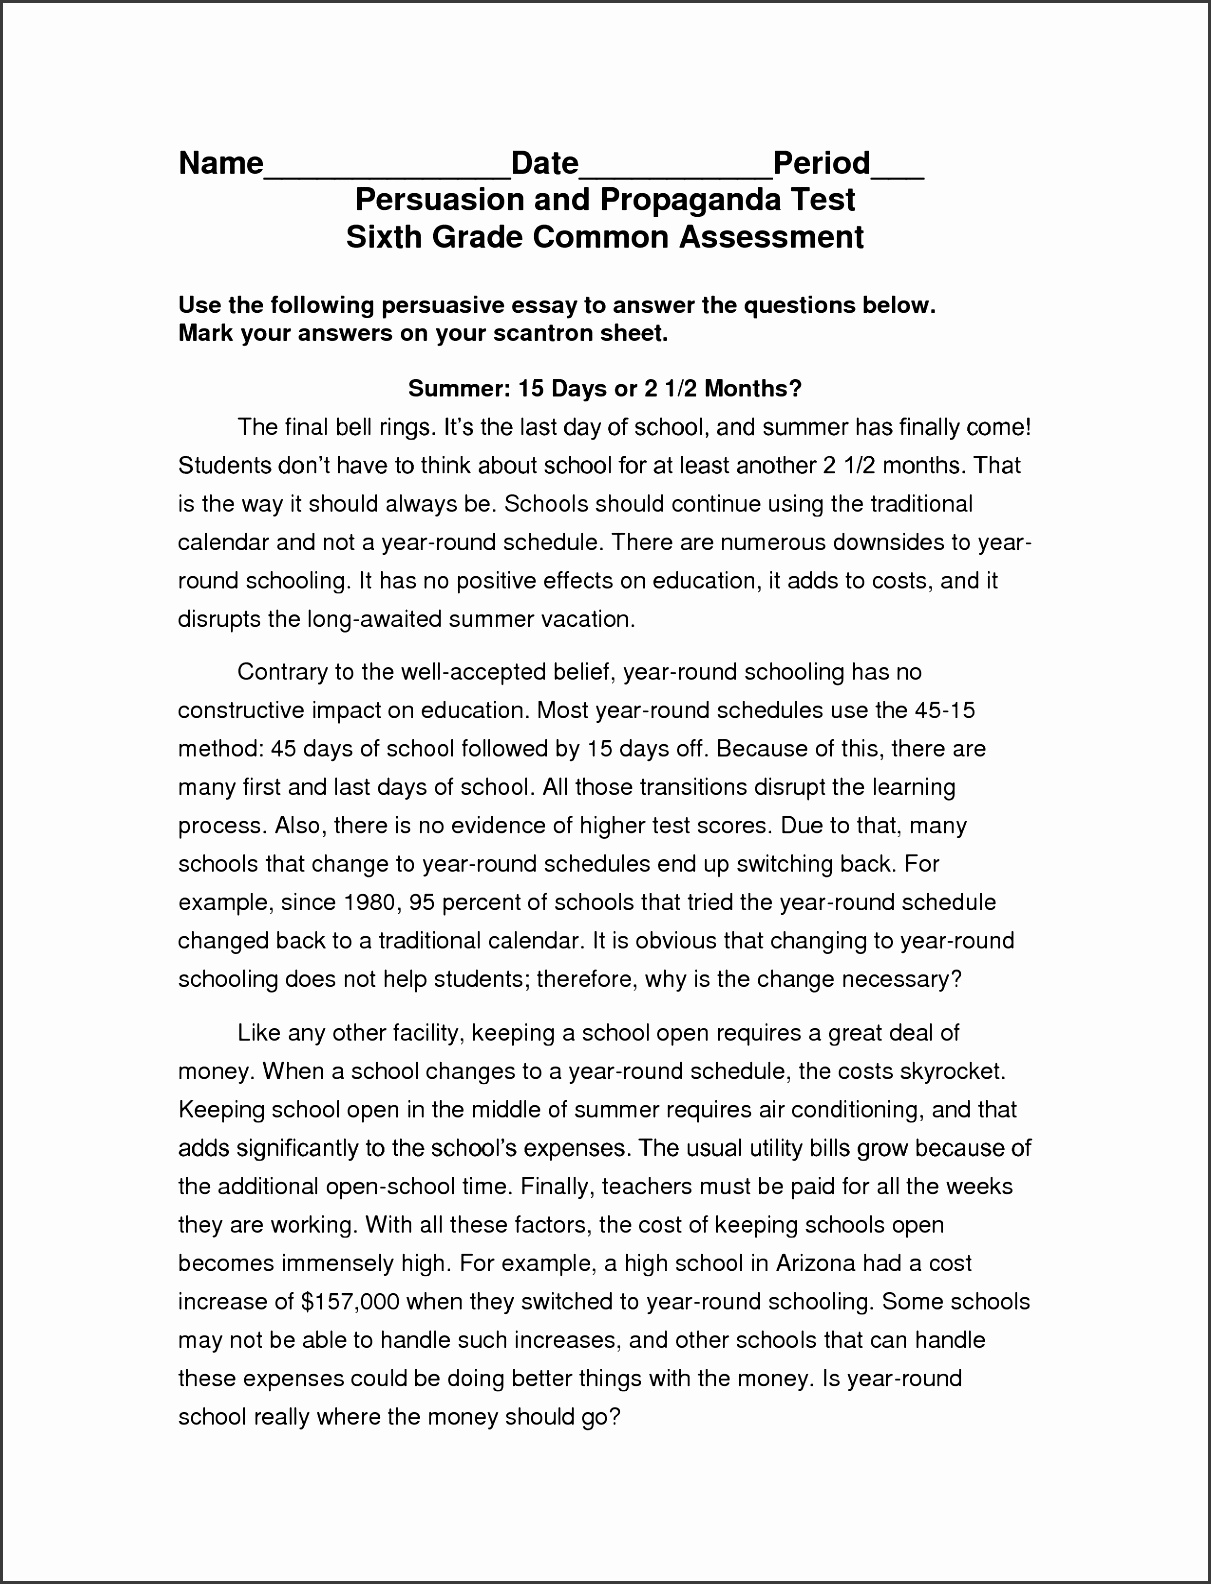 example of persuasive essay outline 32 persuasive essay examples persuasive essay draft nirop